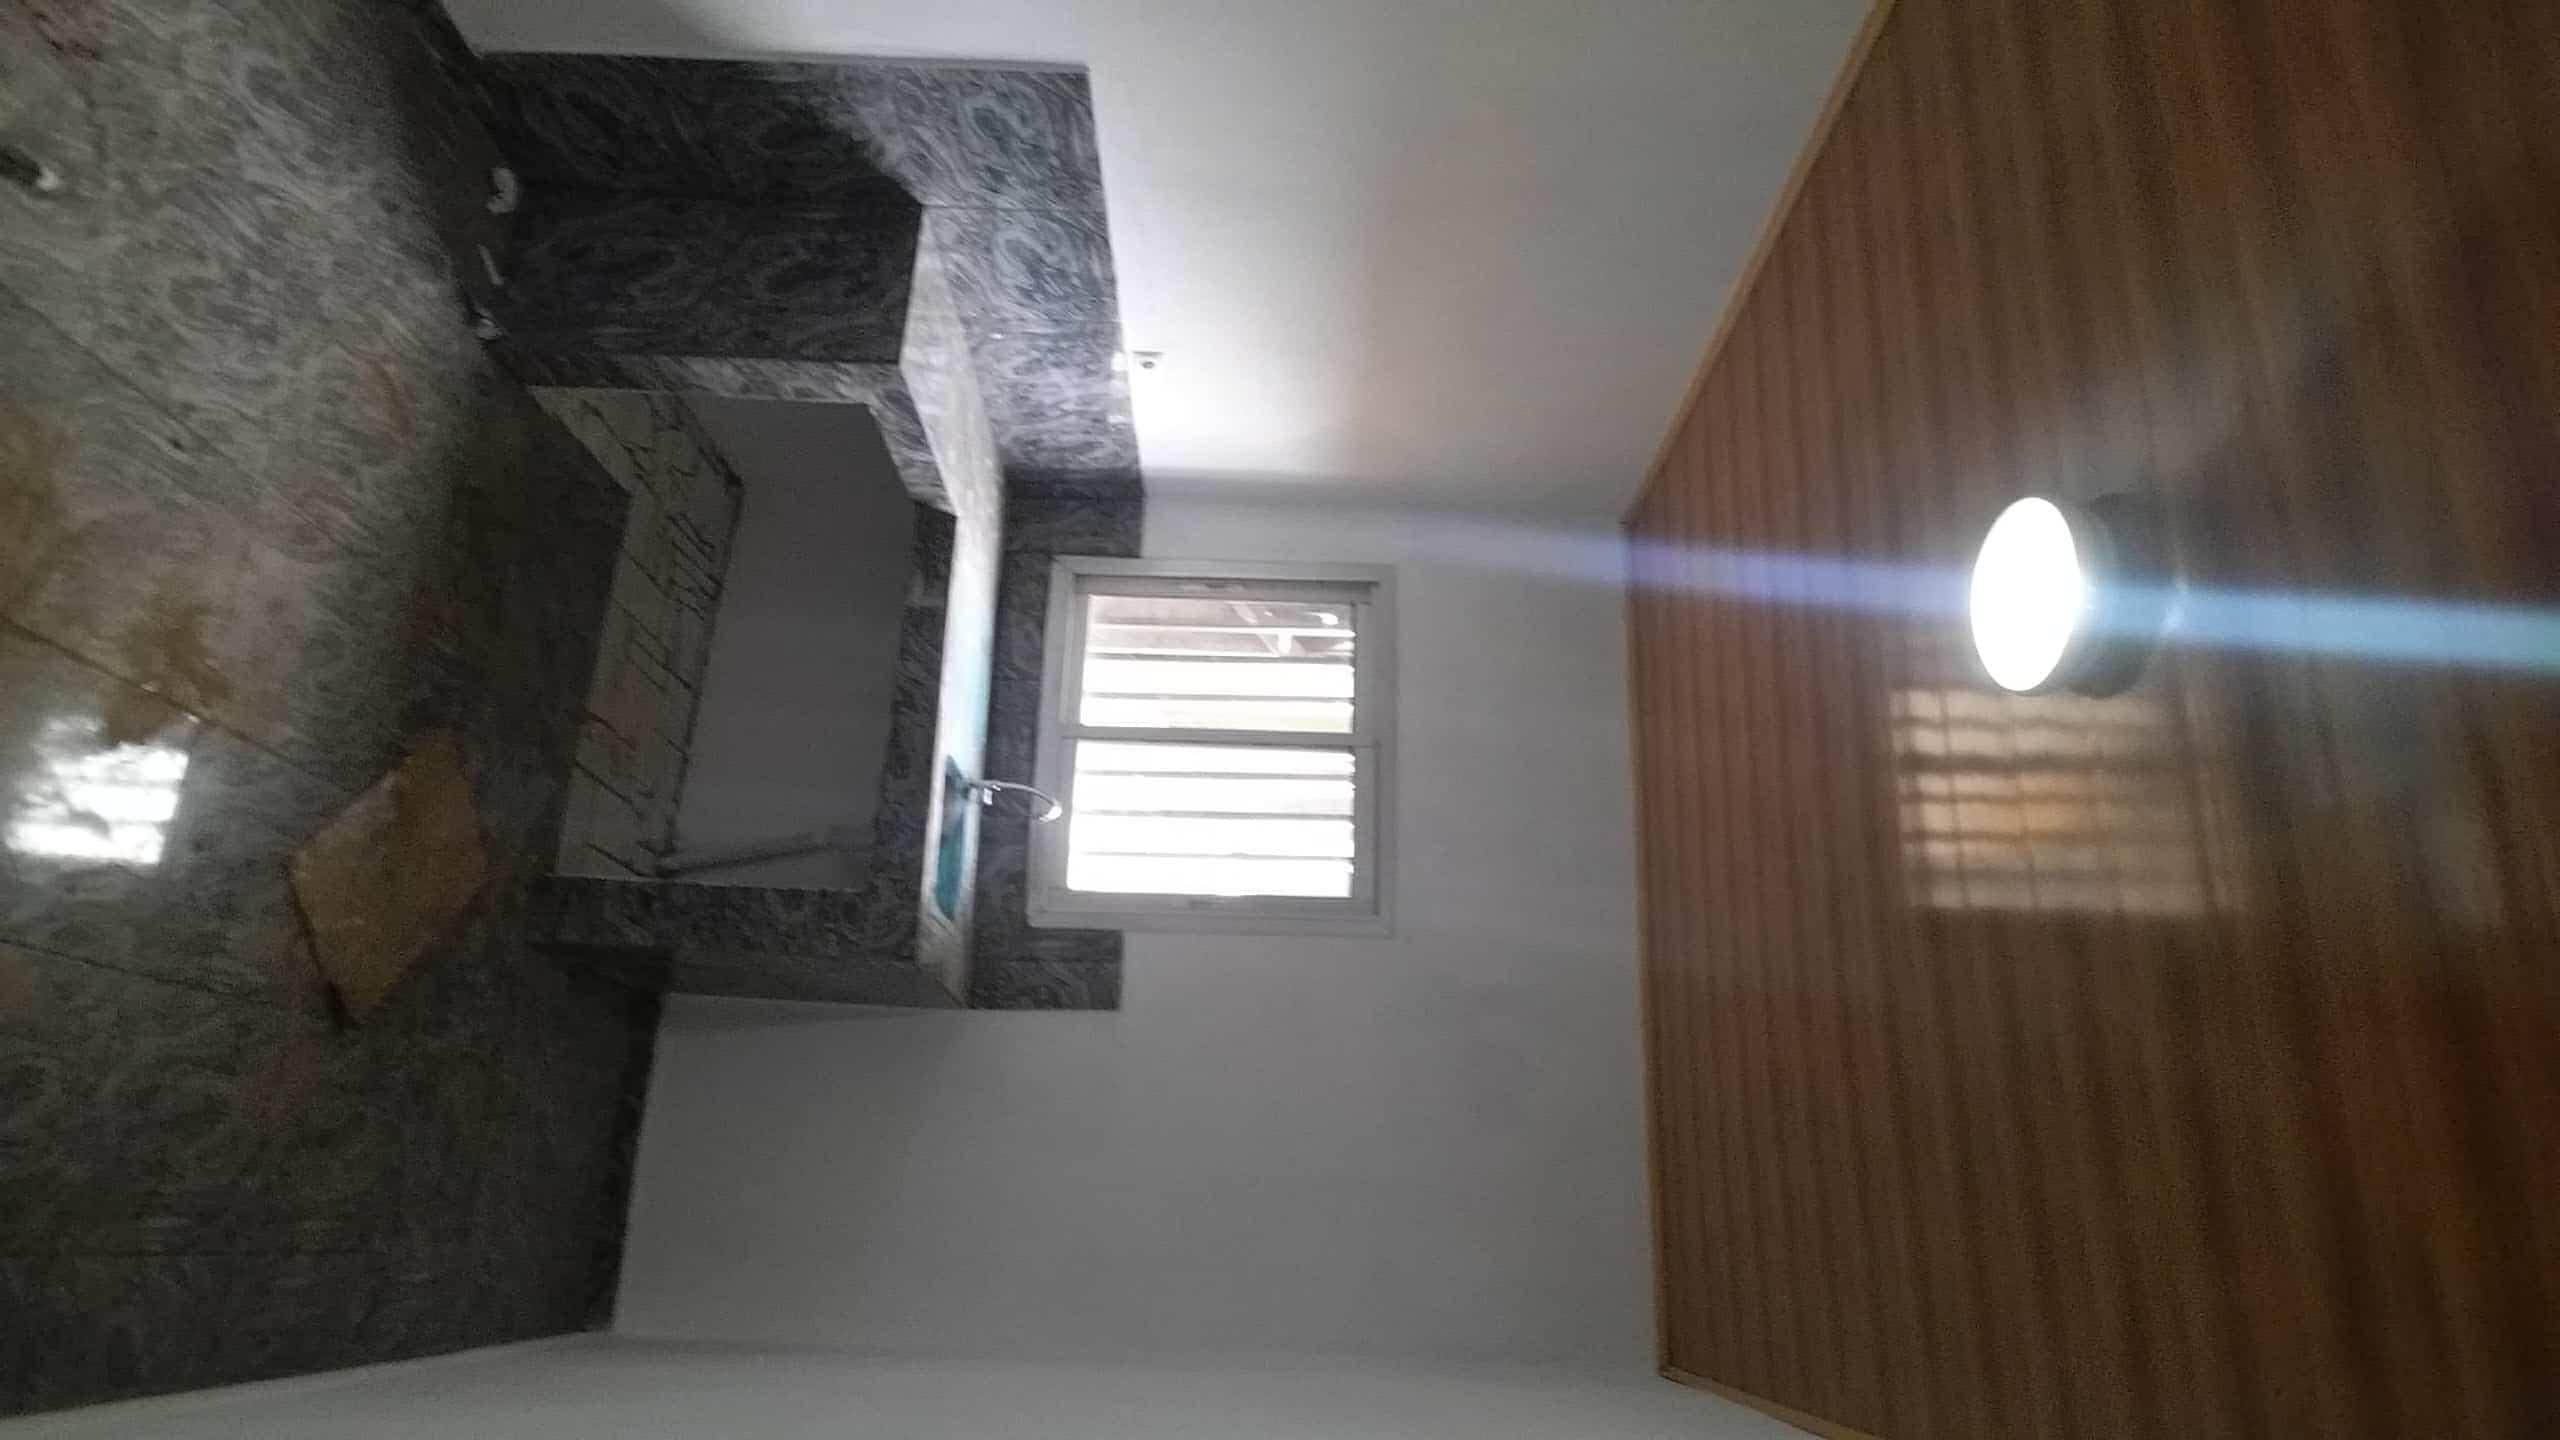 Apartment to rent - Yaoundé, Mimboman II, Opep - 1 living room(s), 3 bedroom(s), 2 bathroom(s) - 120 000 FCFA / month